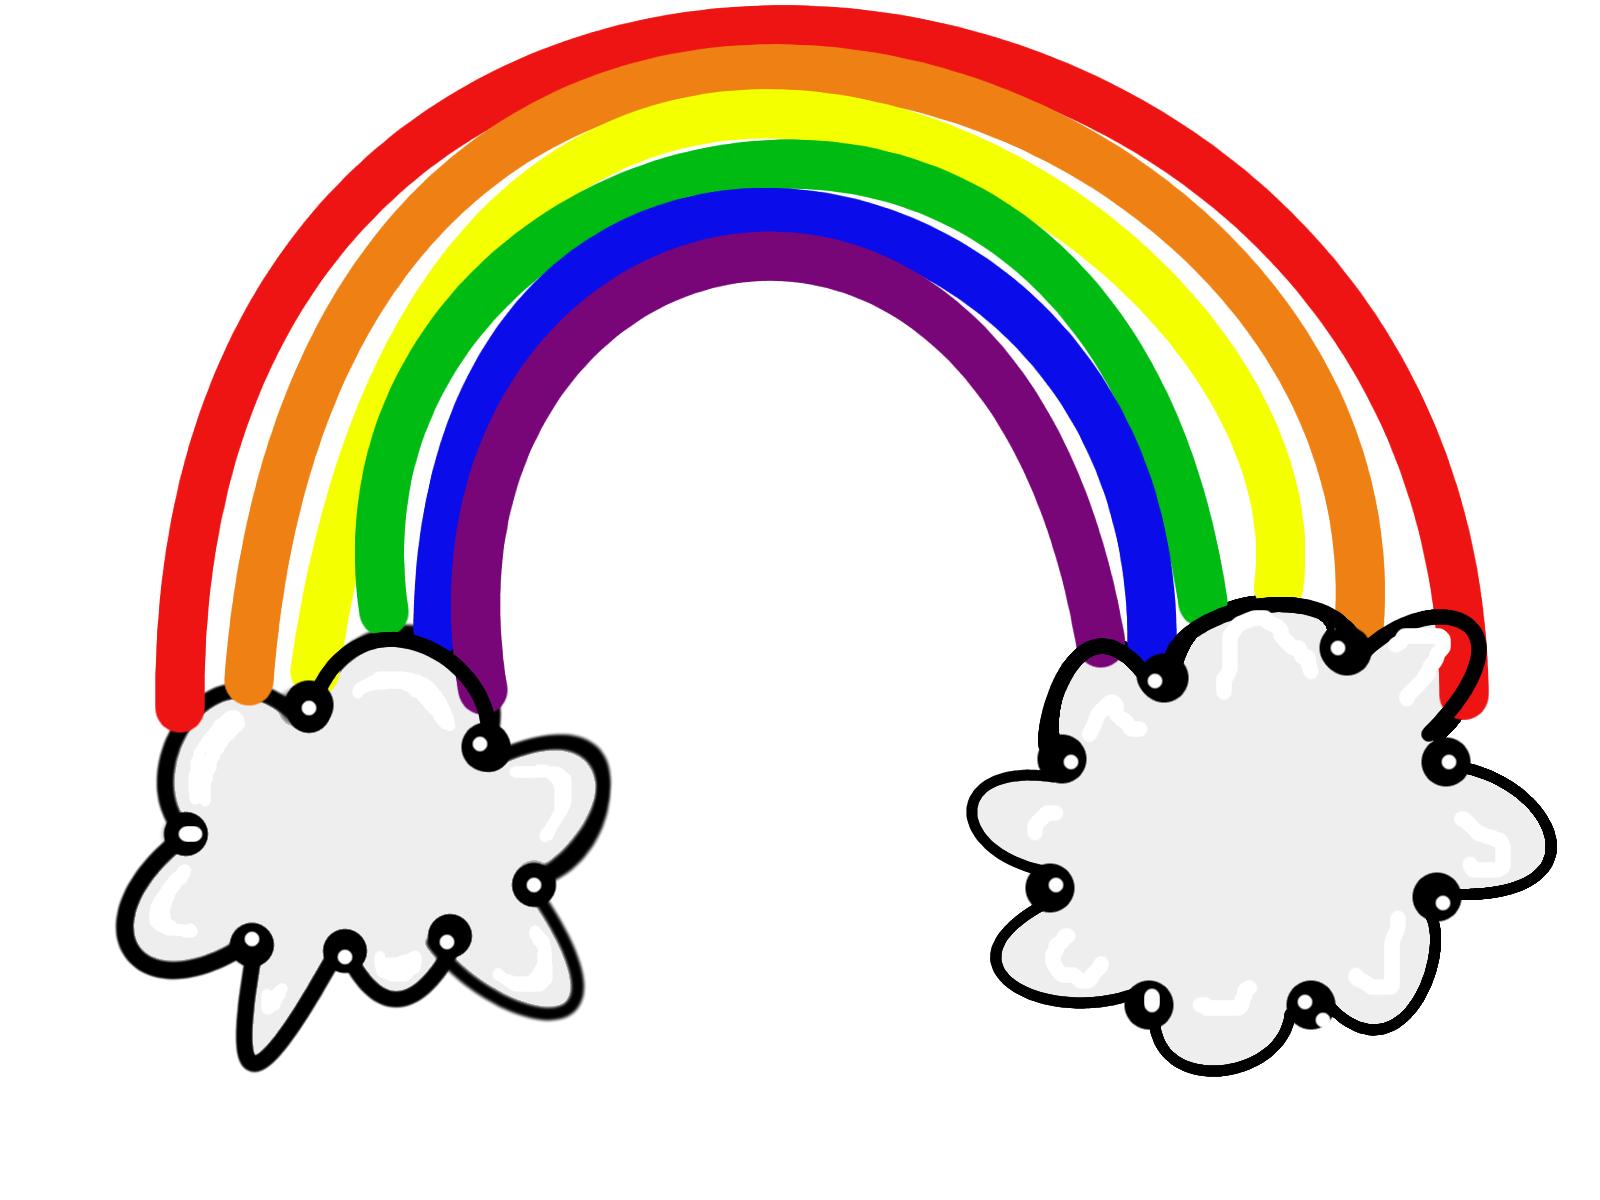 1600x1200 Top 66 Rainbow Clip Art